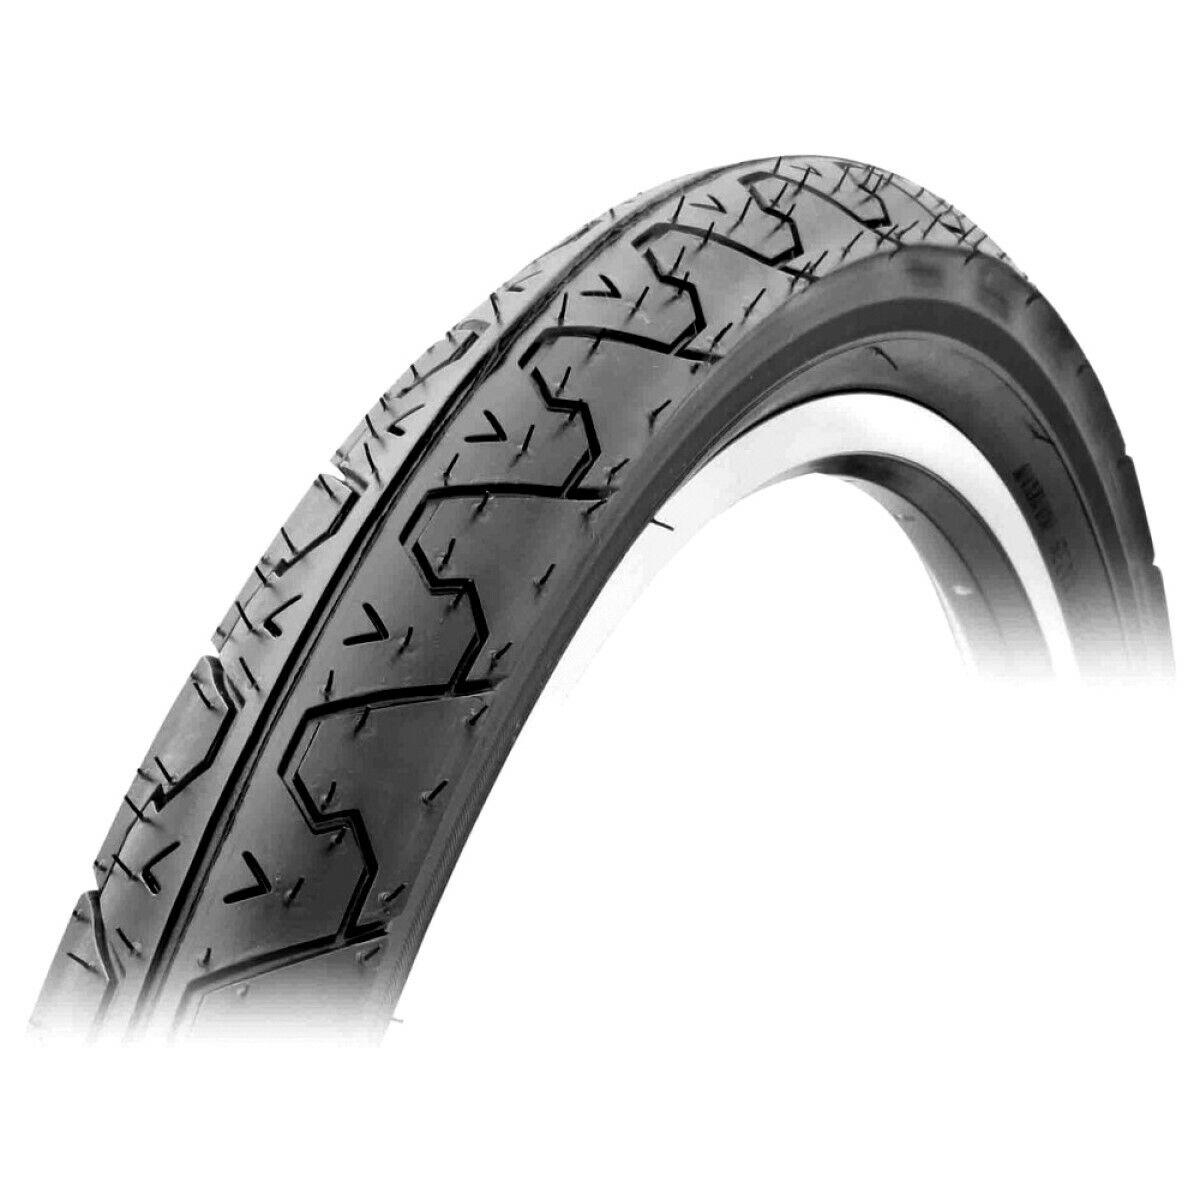 "2 X Kenda K816 20/"" X 1.95 Wire Bead MTB BMX Bike Bicycle Tyre Black KT40PD"